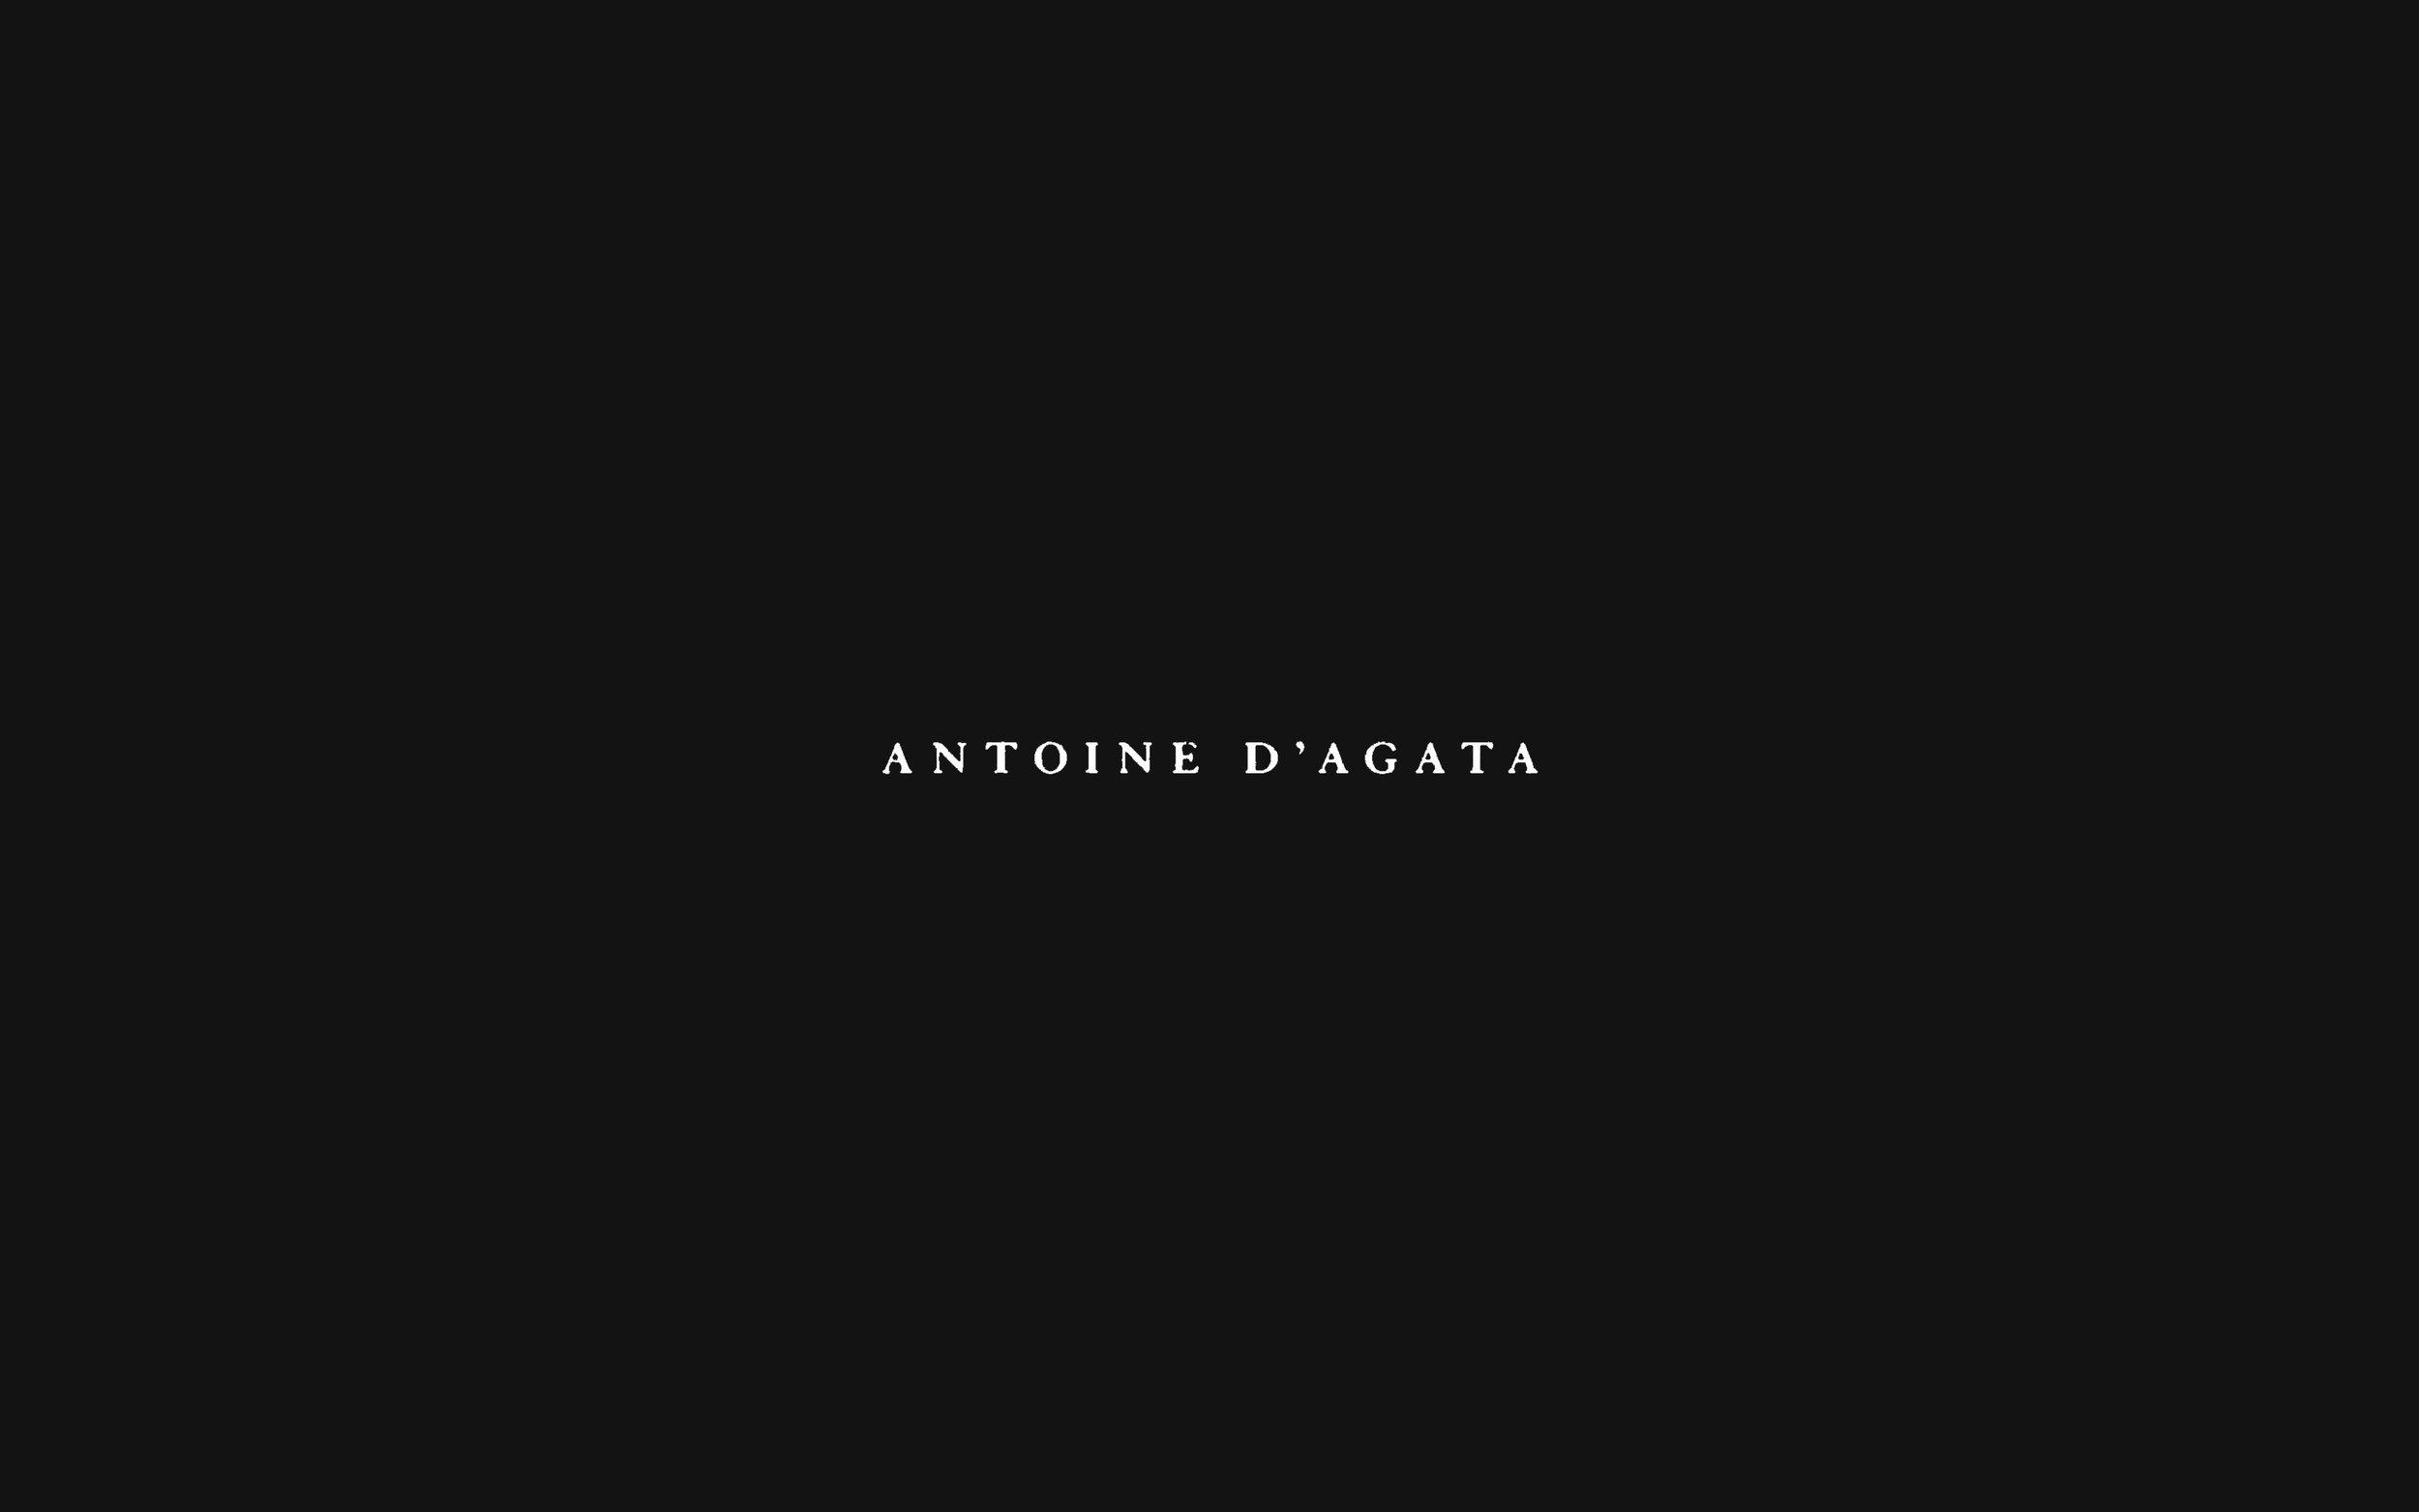 1B__Antoine_d'Agata_00.jpg